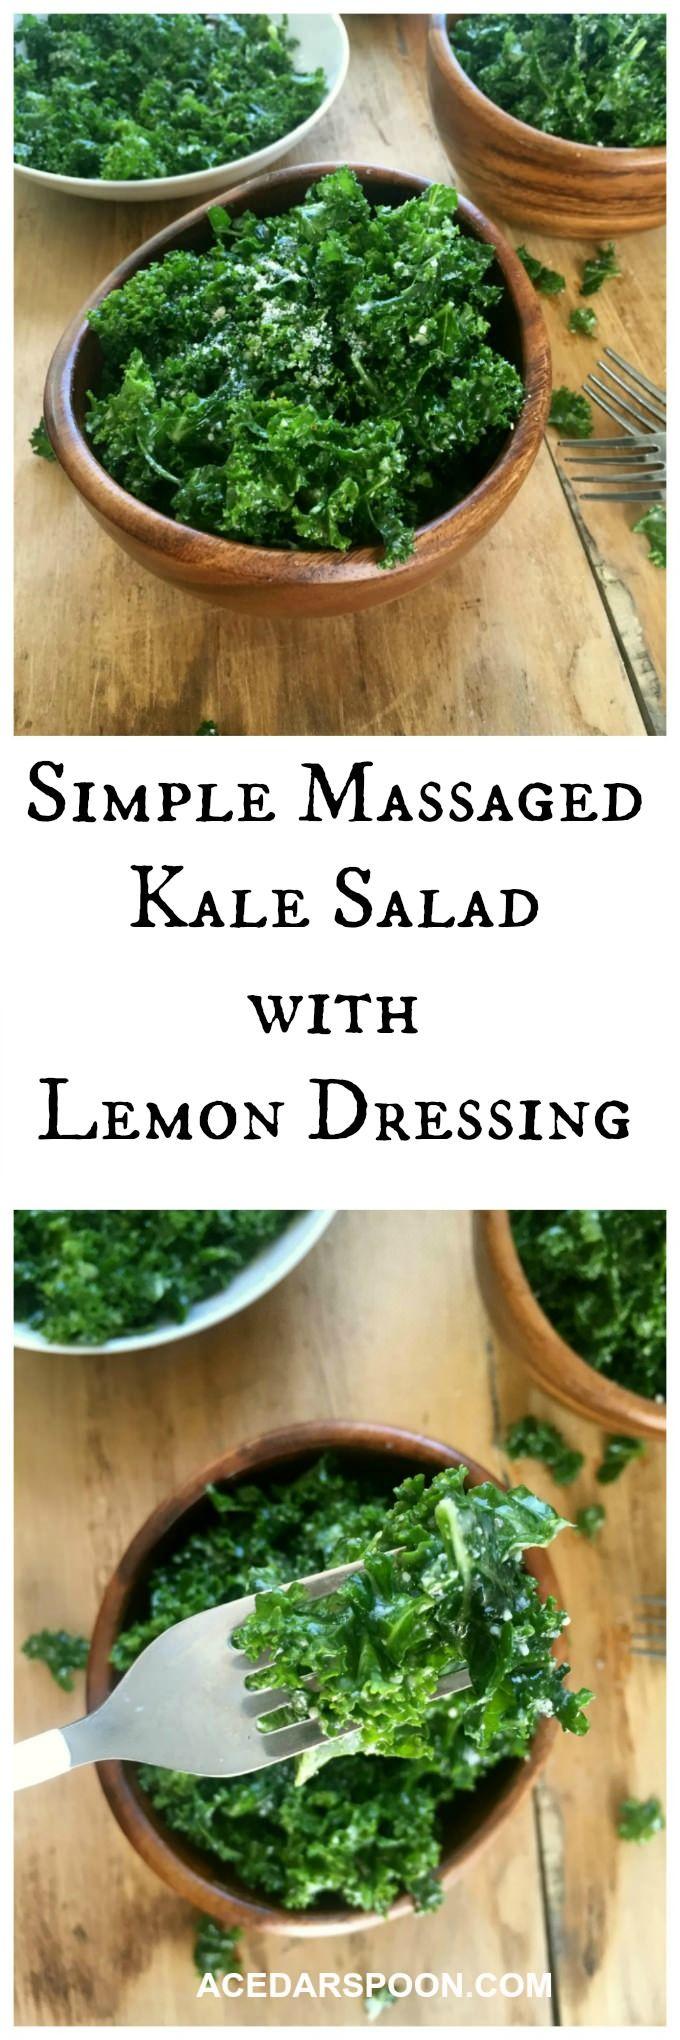 Simple Massage Kale Salad with Lemon Dressing--altered dressing a bit based on another recipe--2T lemon juice, 2T red wine vinegar, 1 garlic clove, pinch mustard powder, 4T oil. So yummy!